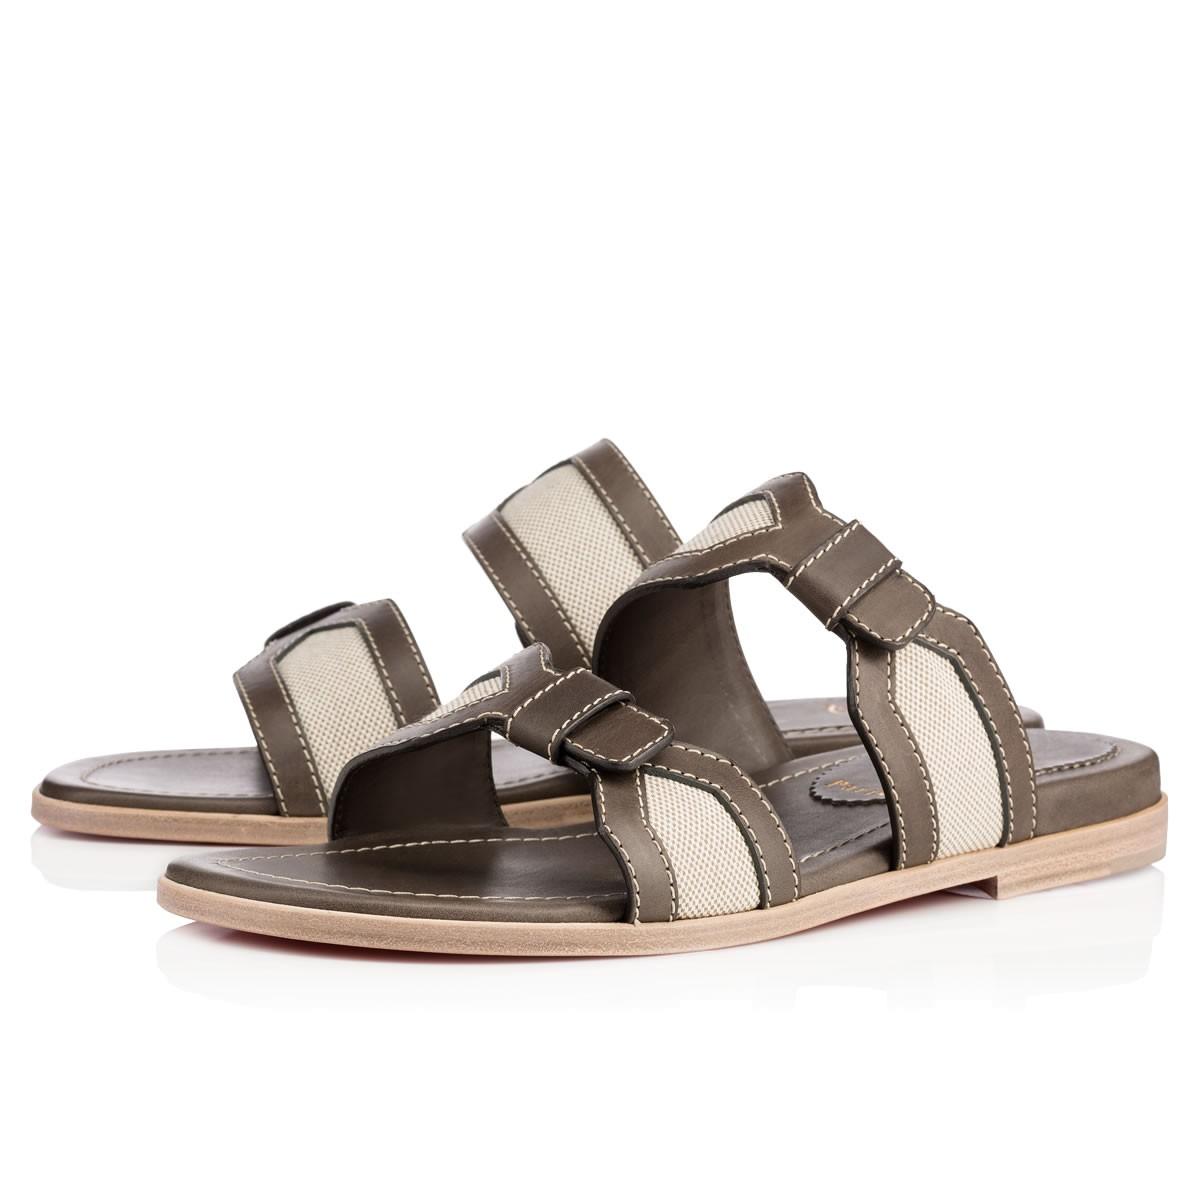 Christian Louboutin Leather Slide Sandals Louboutin